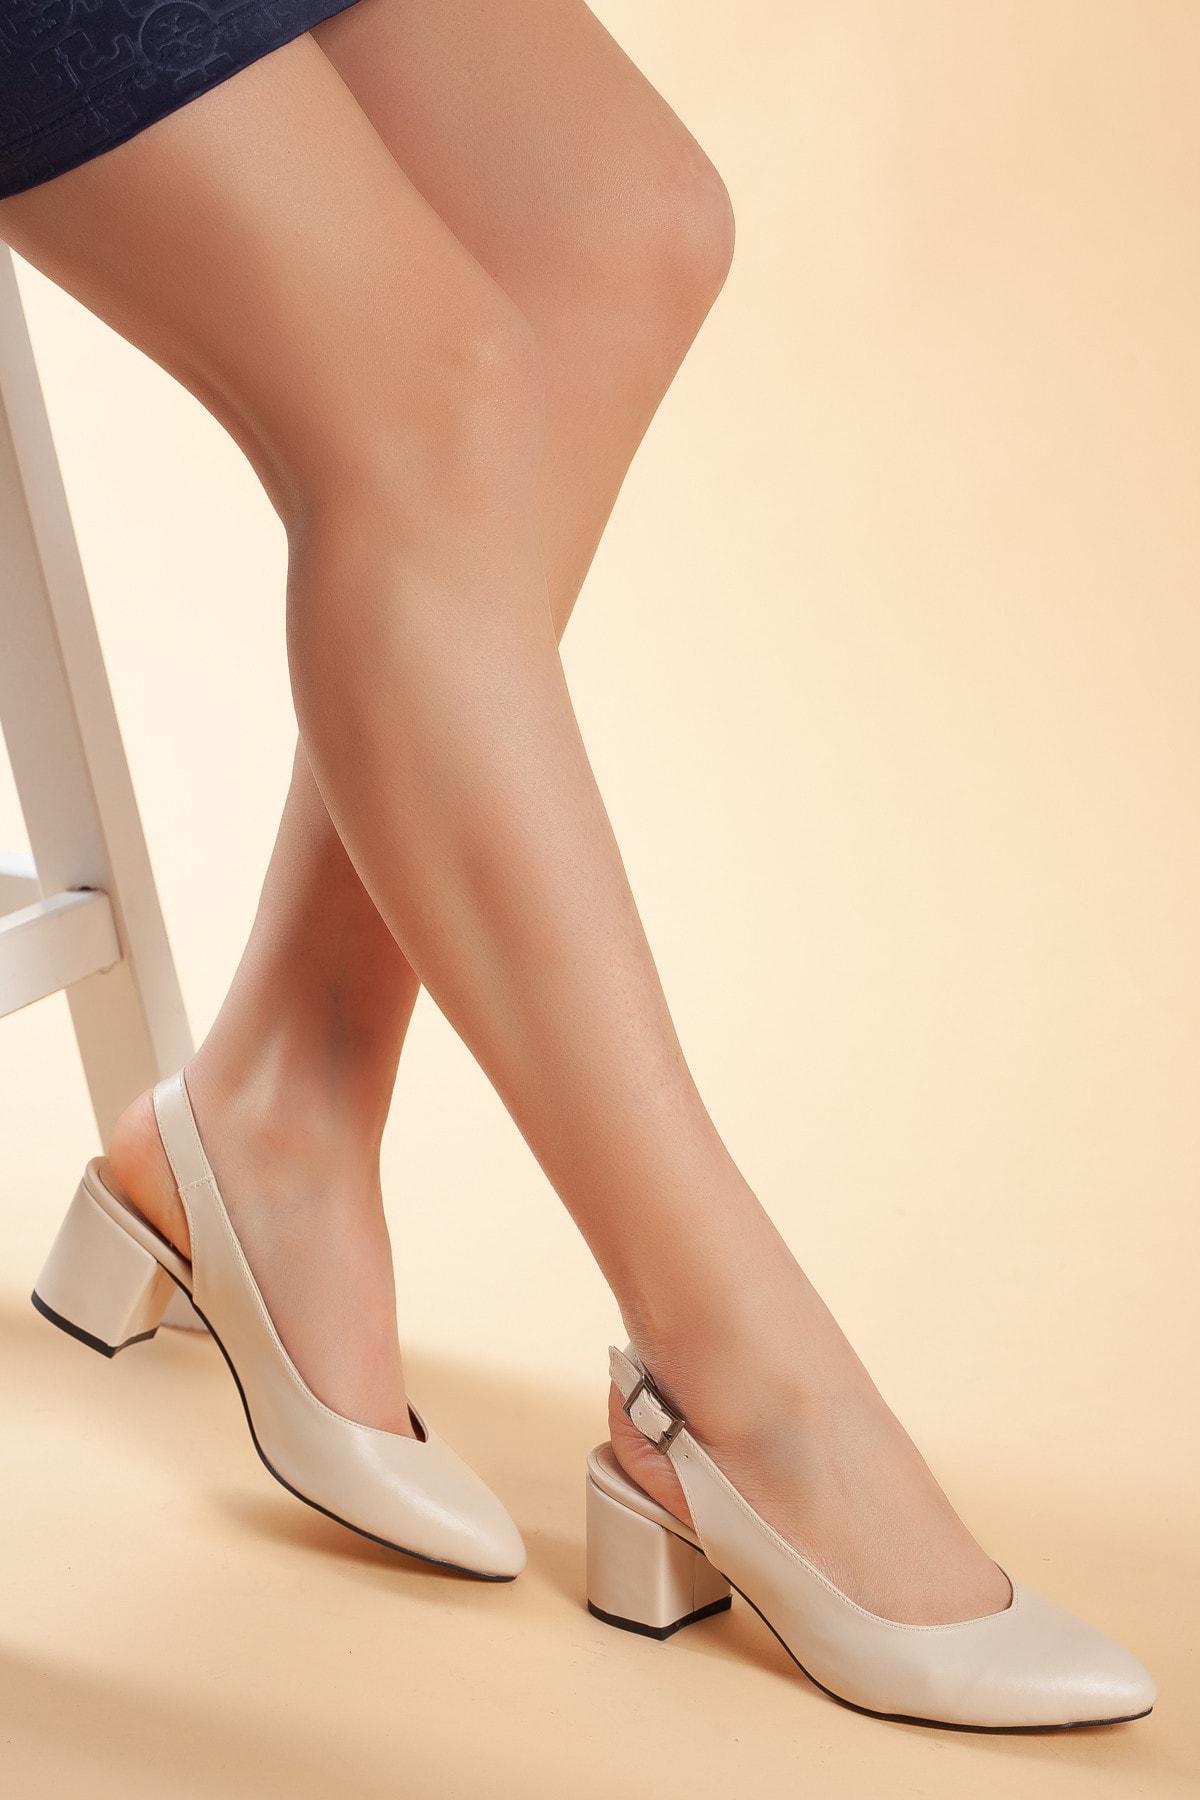 Daxtors Vizyon Kadın Ayakkabı DXTRSGZH209 1